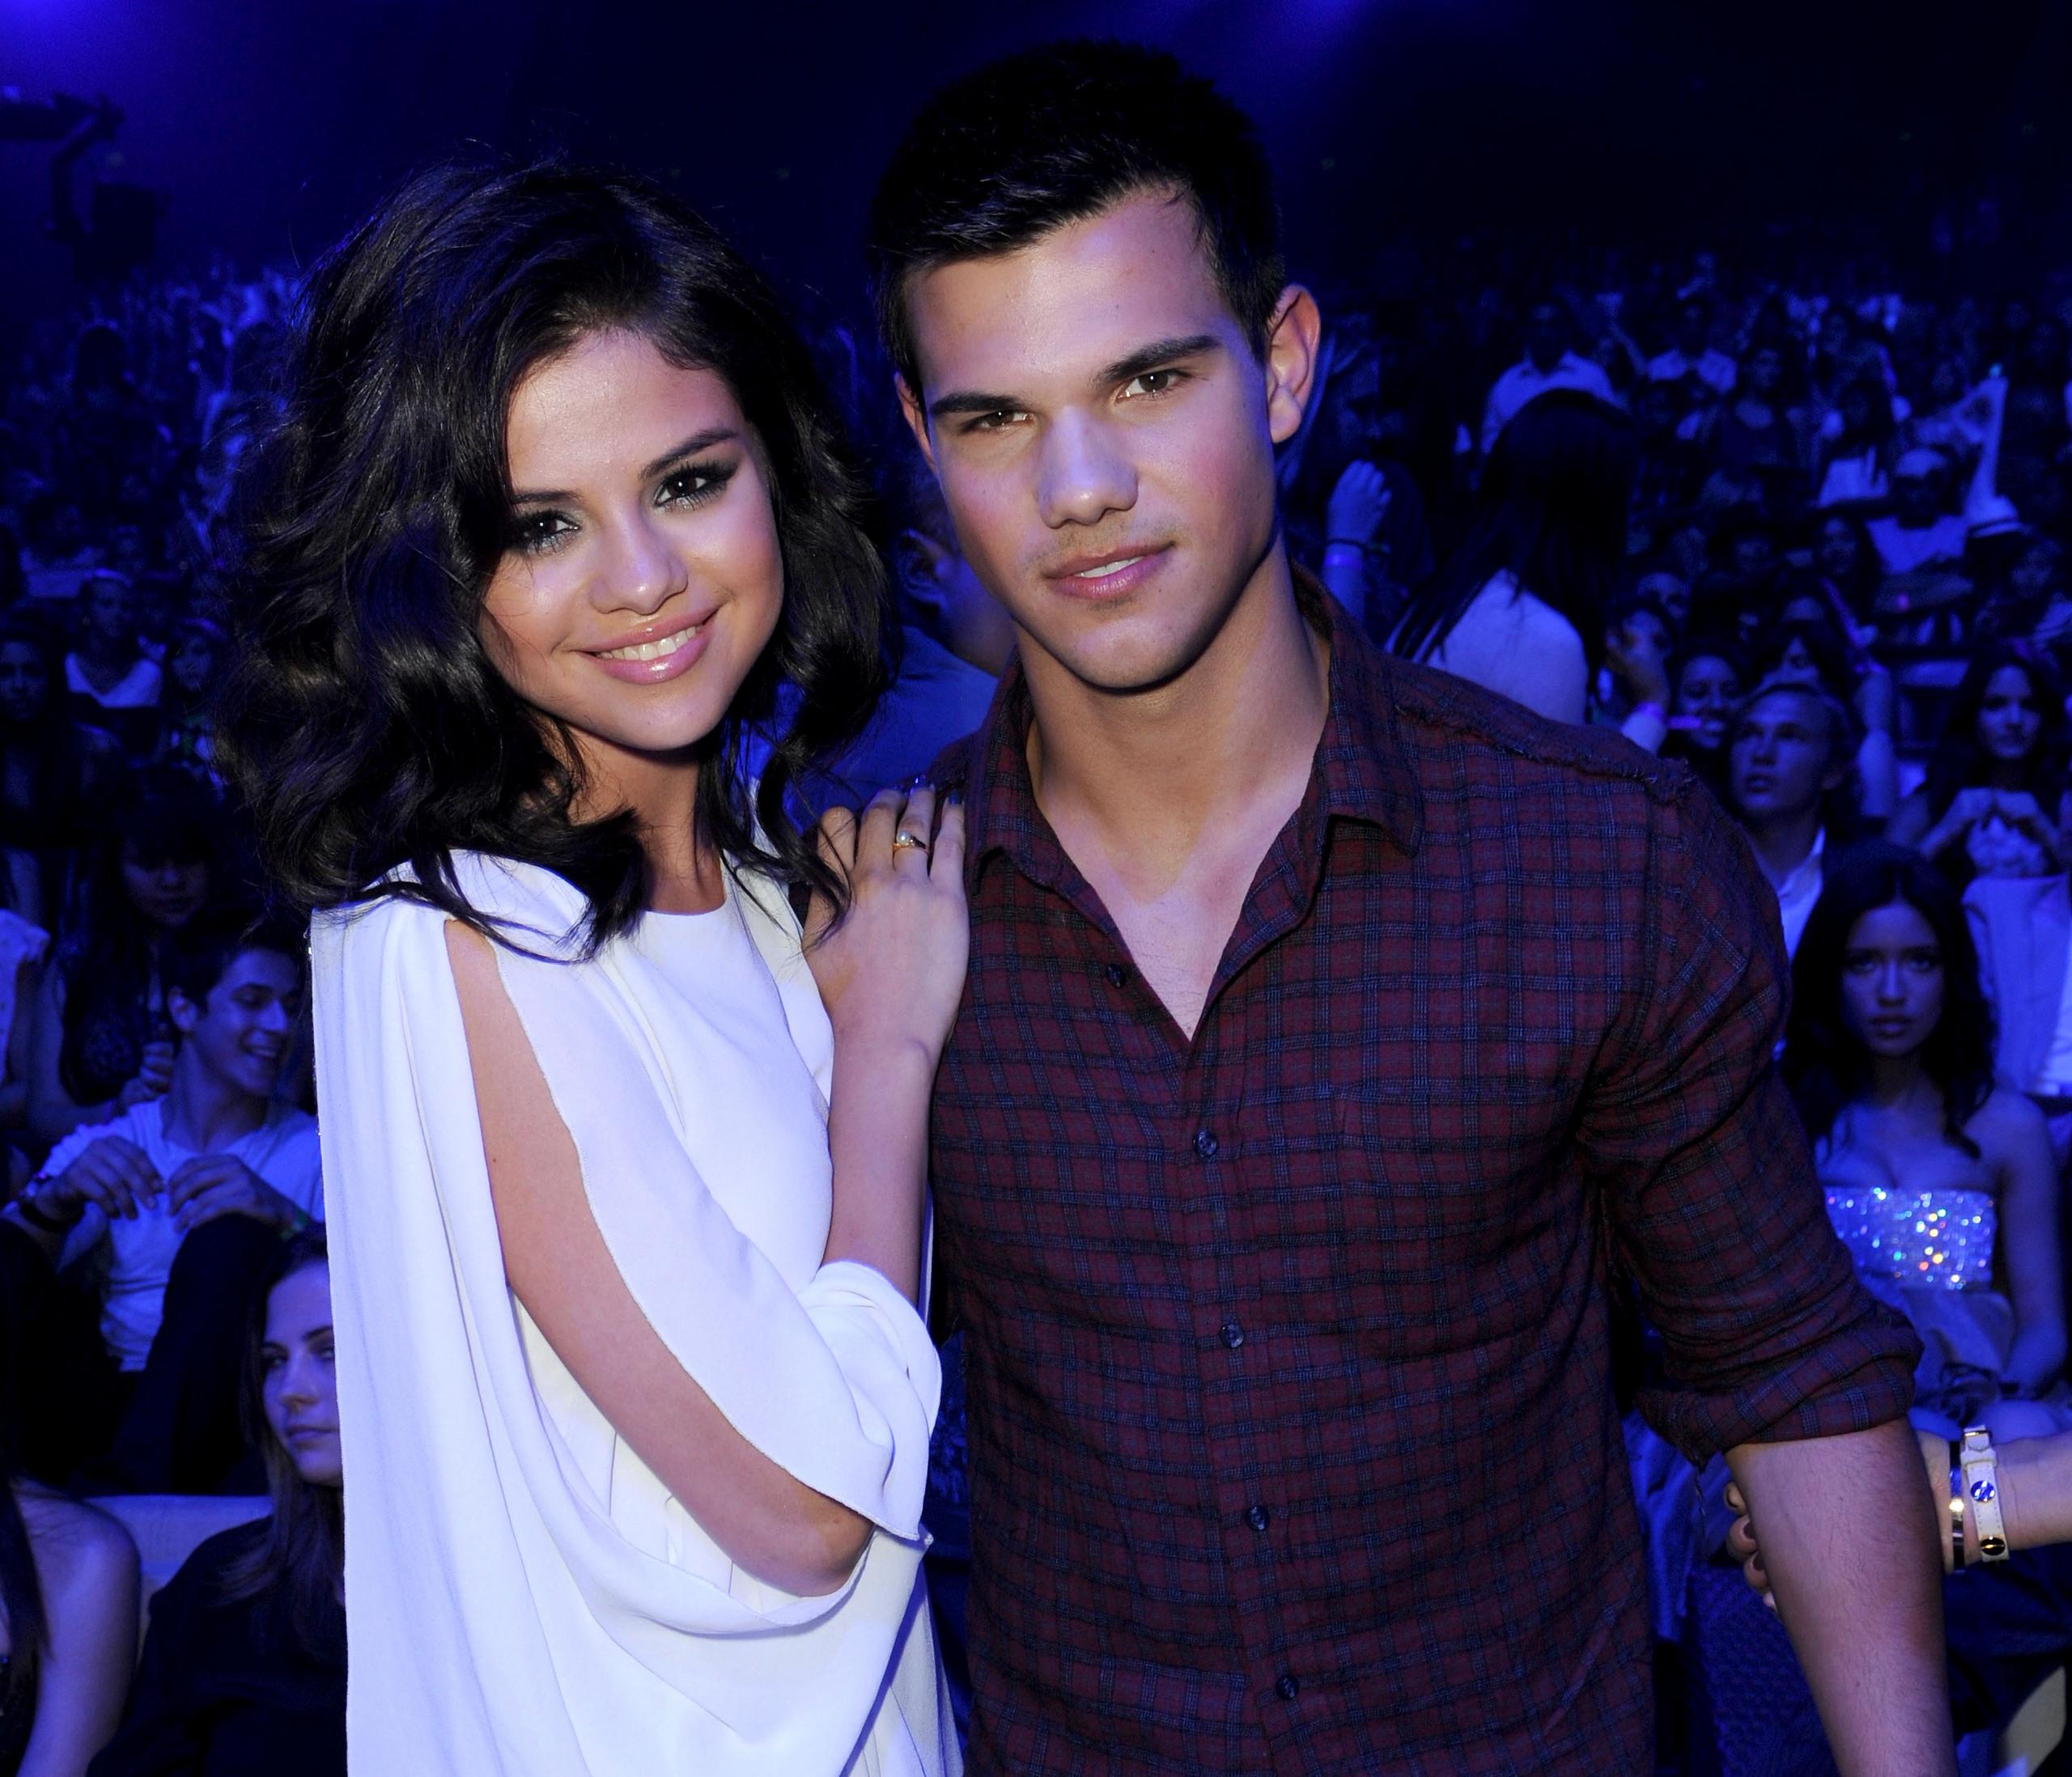 Selena Gomez & Taylor Lautner images selena & taylor